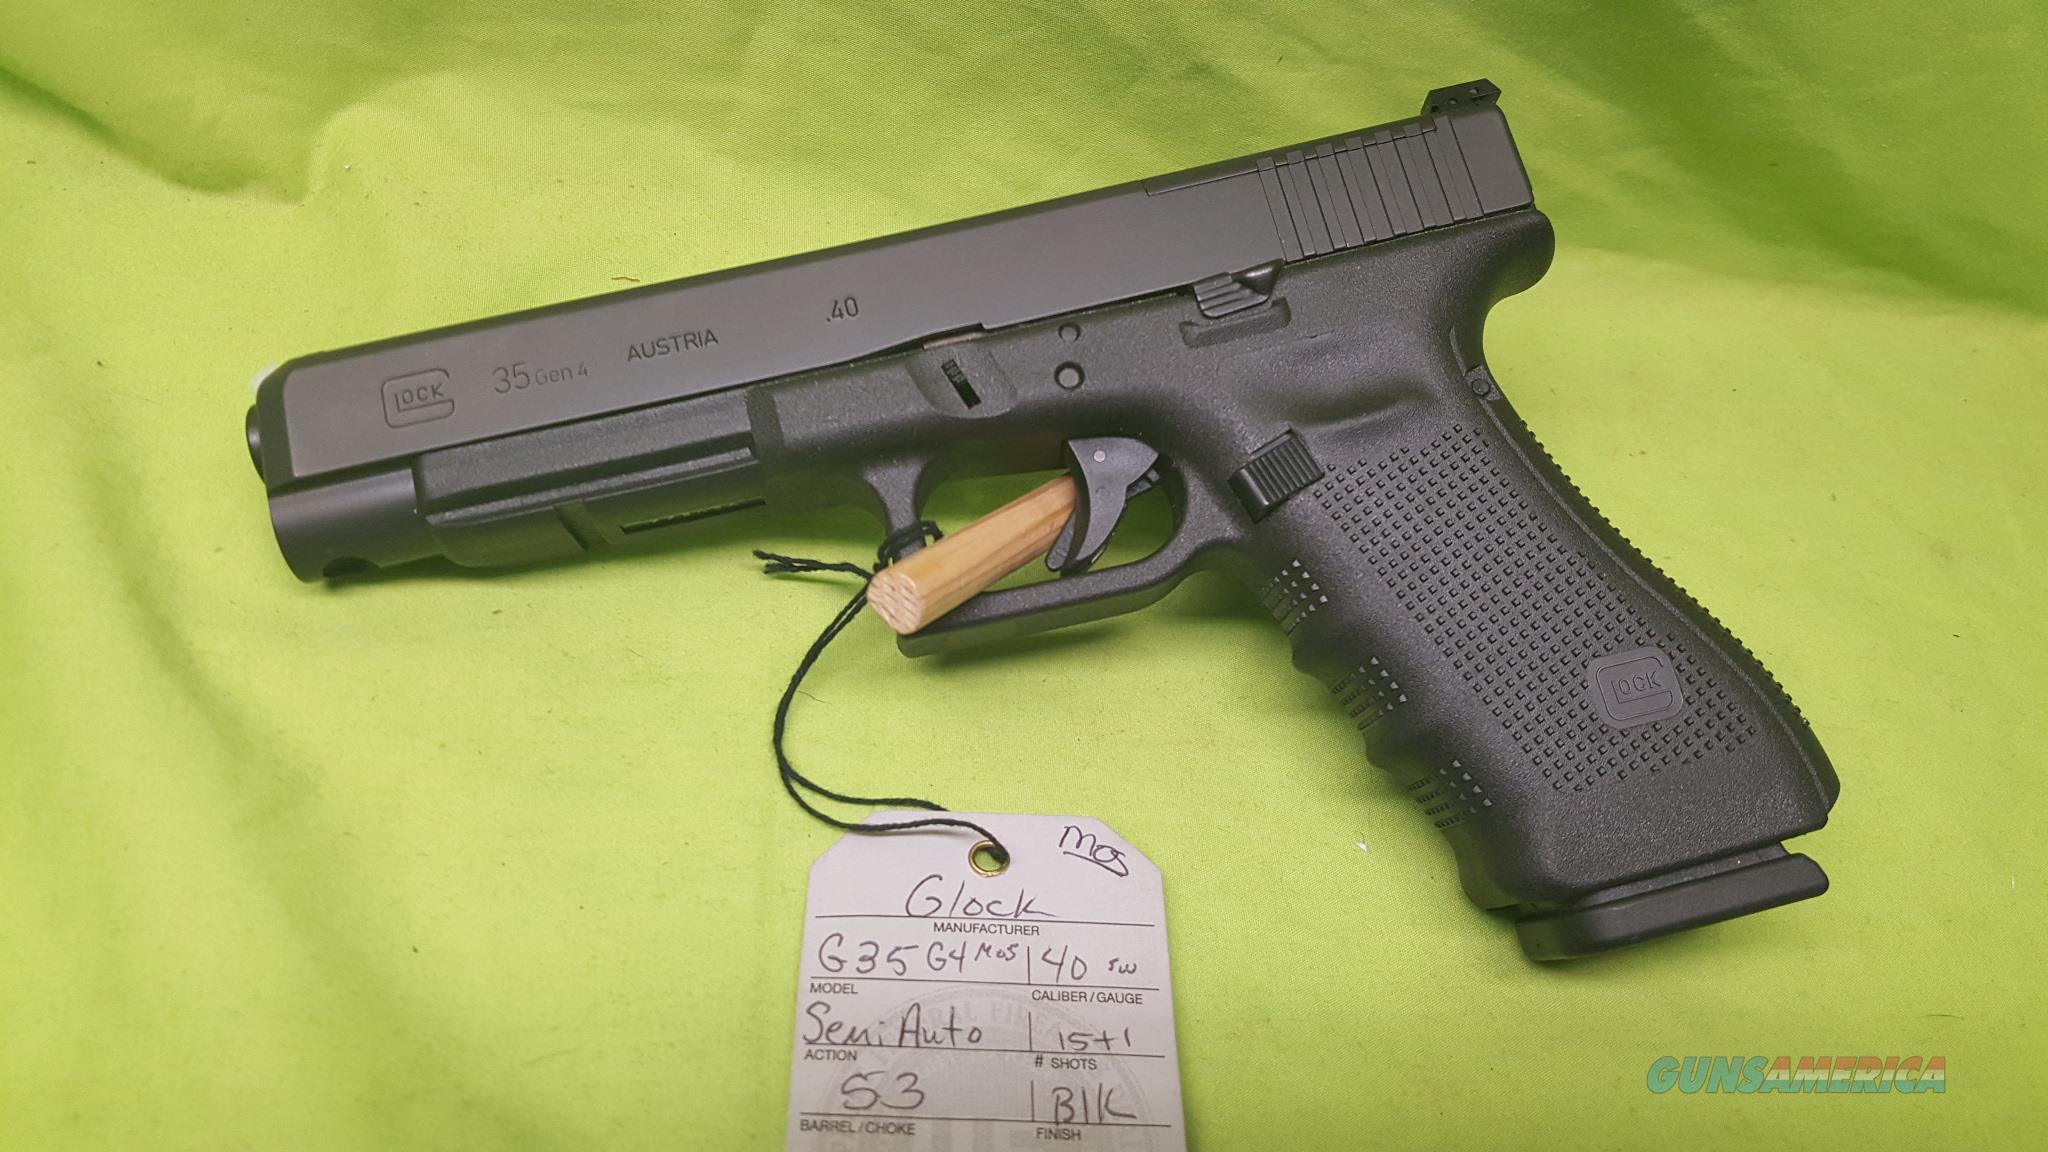 GLOCK 35 GEN 4 40SW 40 S&W 15RD MOS RMR RAIL G35  Guns > Pistols > Glock Pistols > 35